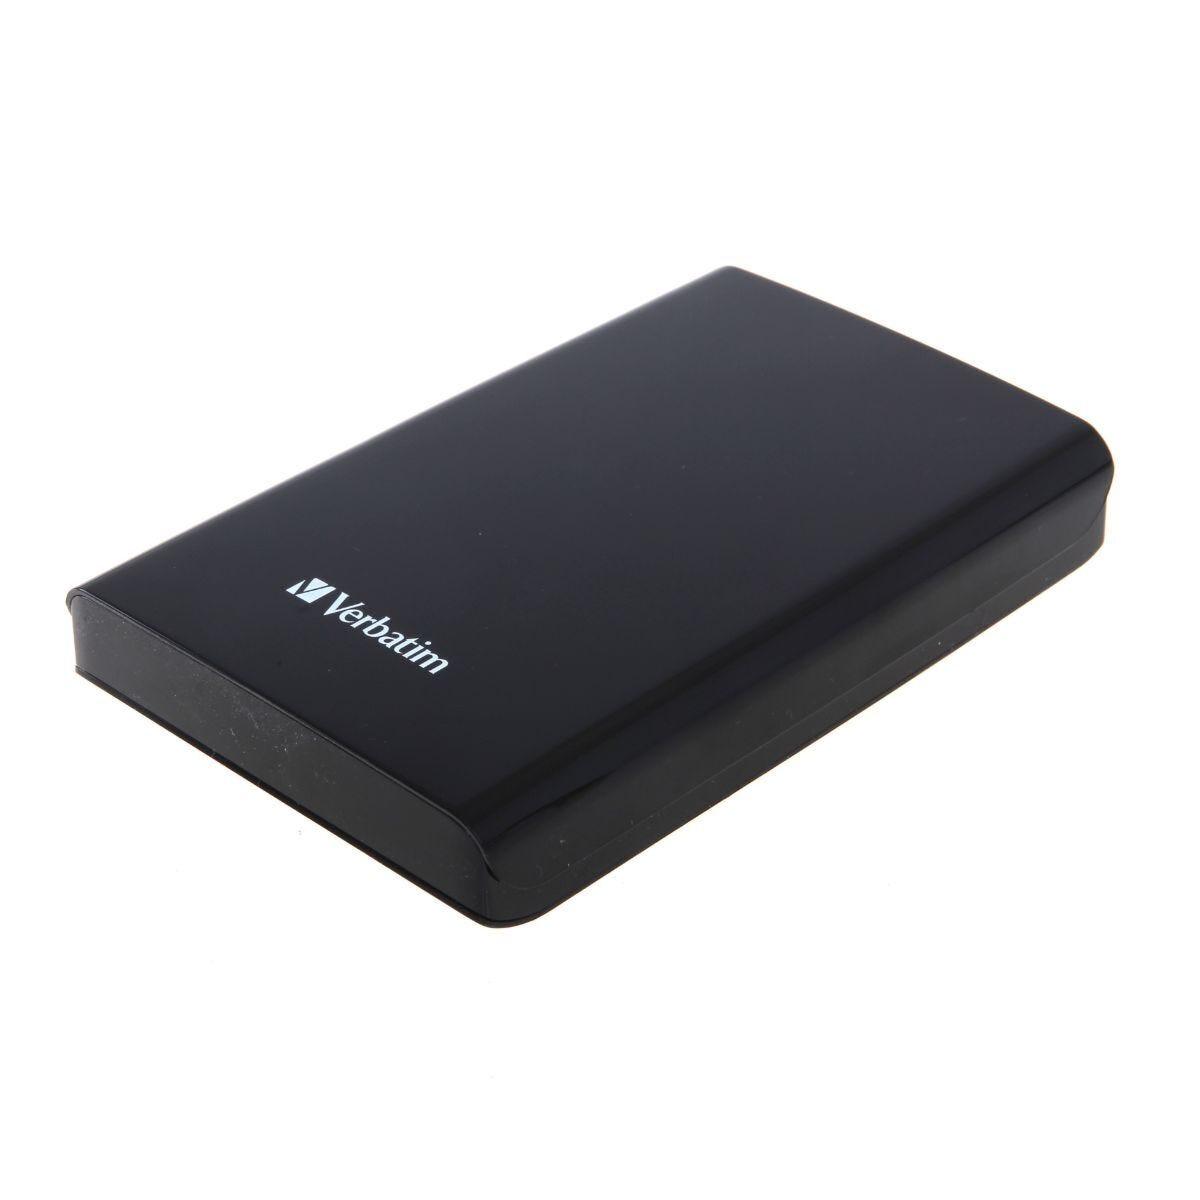 Verbatim Store n Go External Hard Drive 1TB USB 3.0 Portable